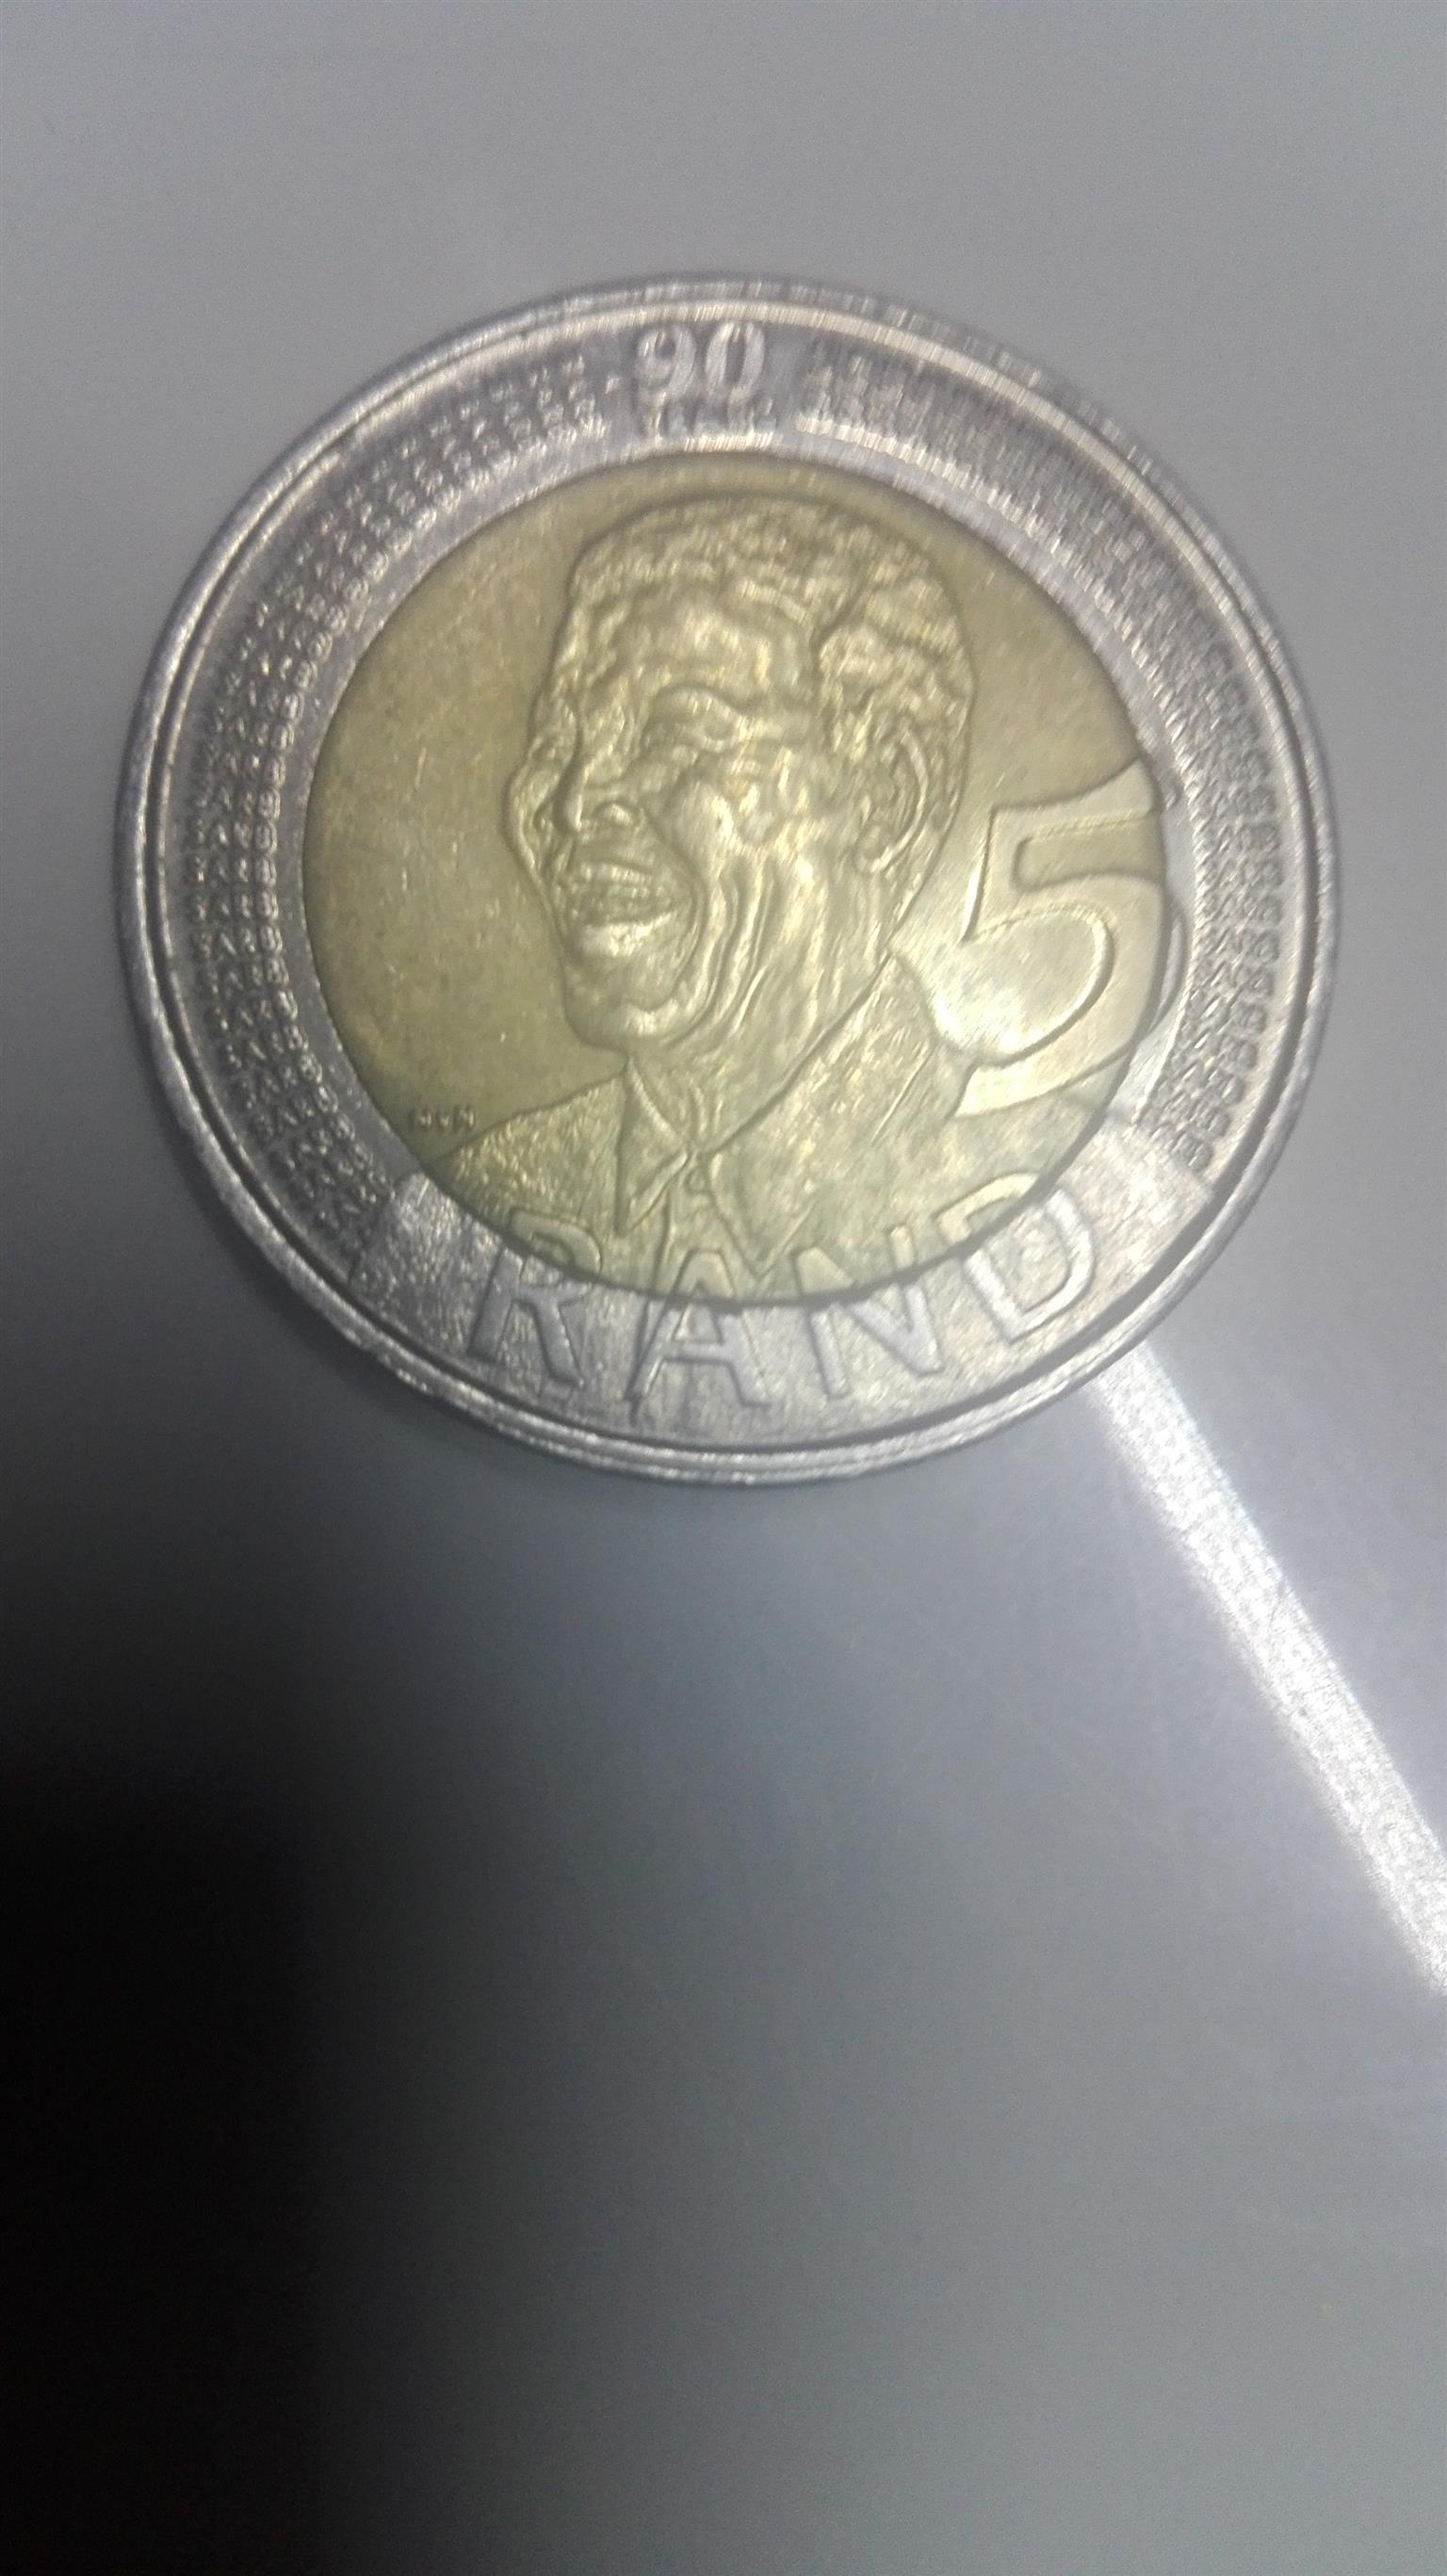 2008 Mandela coin 90th birthday